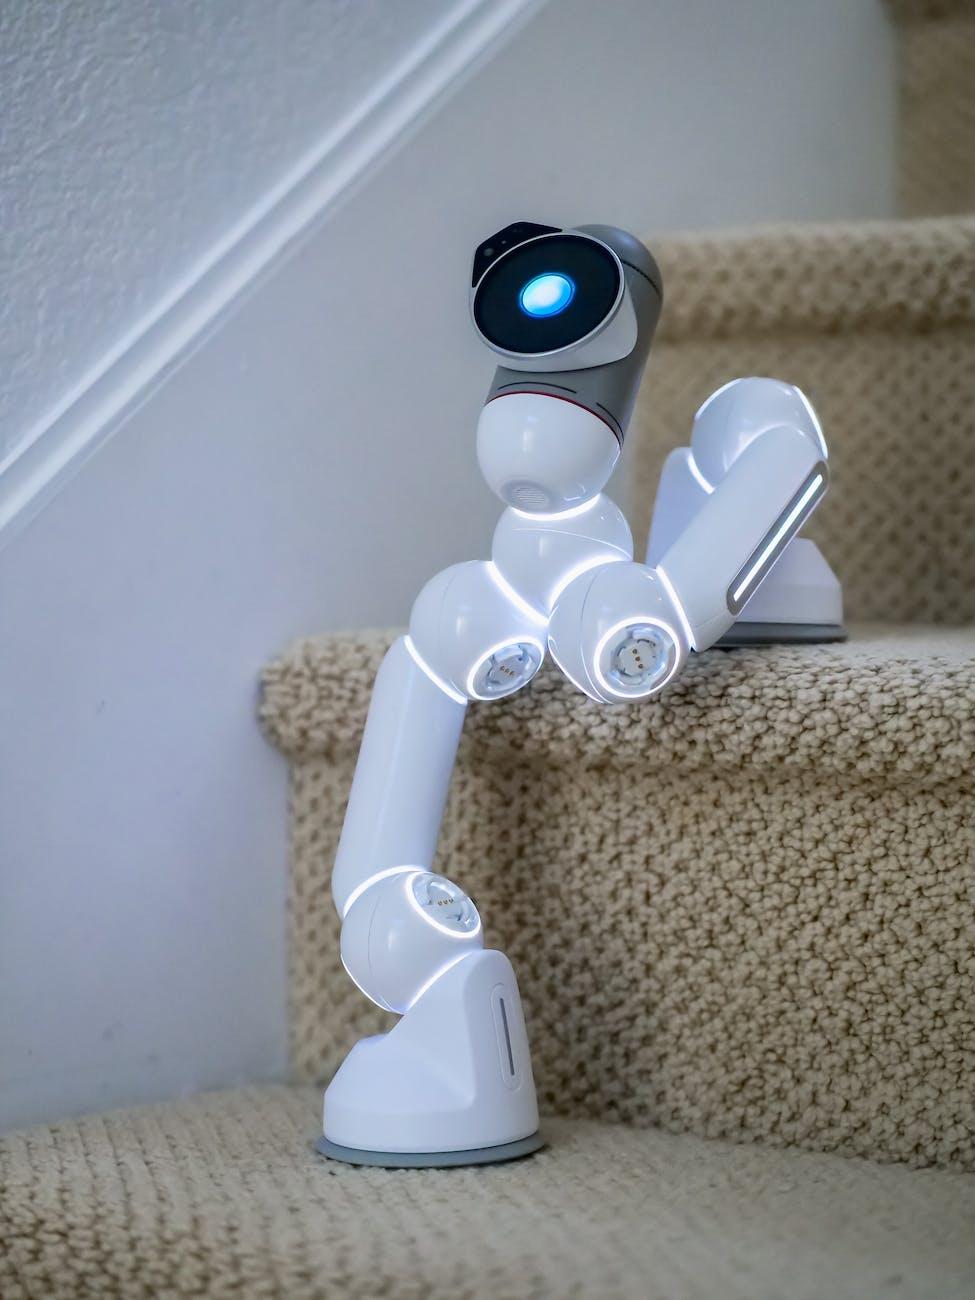 Cobot technology